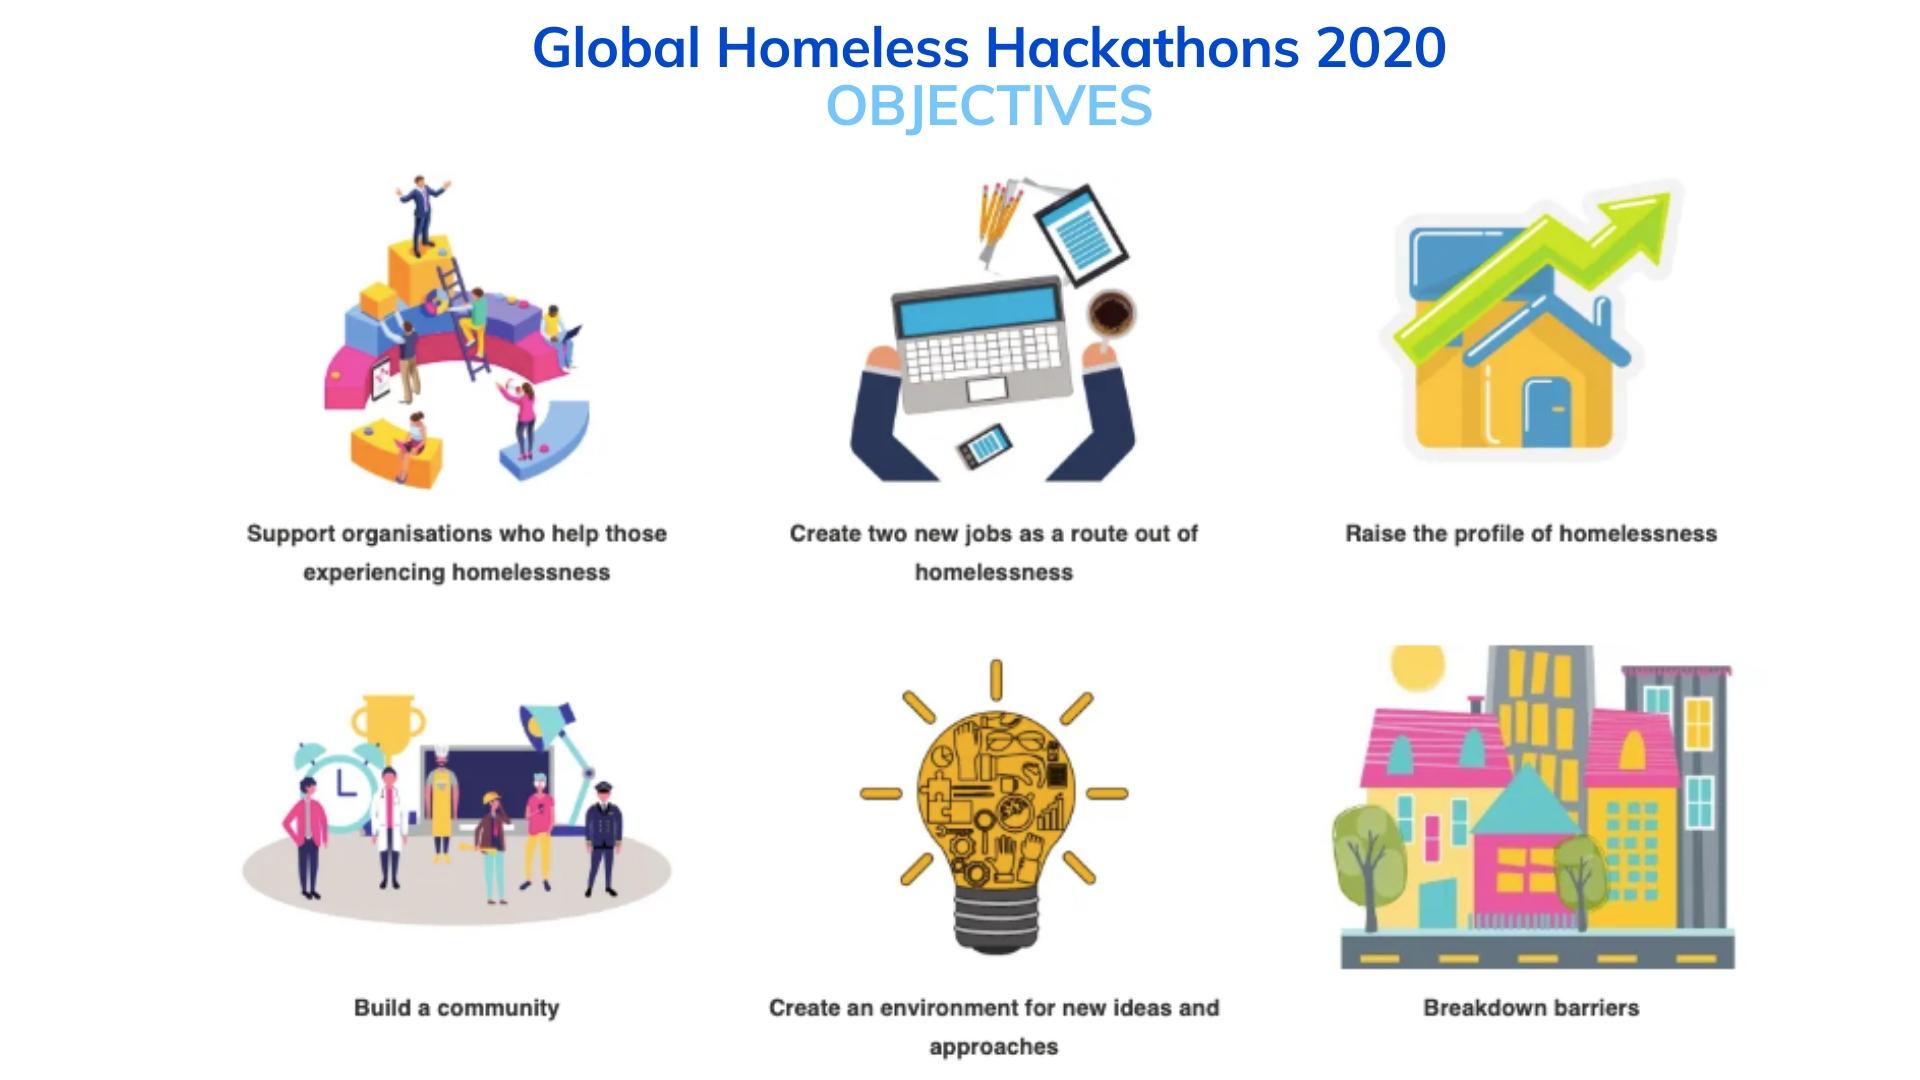 homeless hackathons